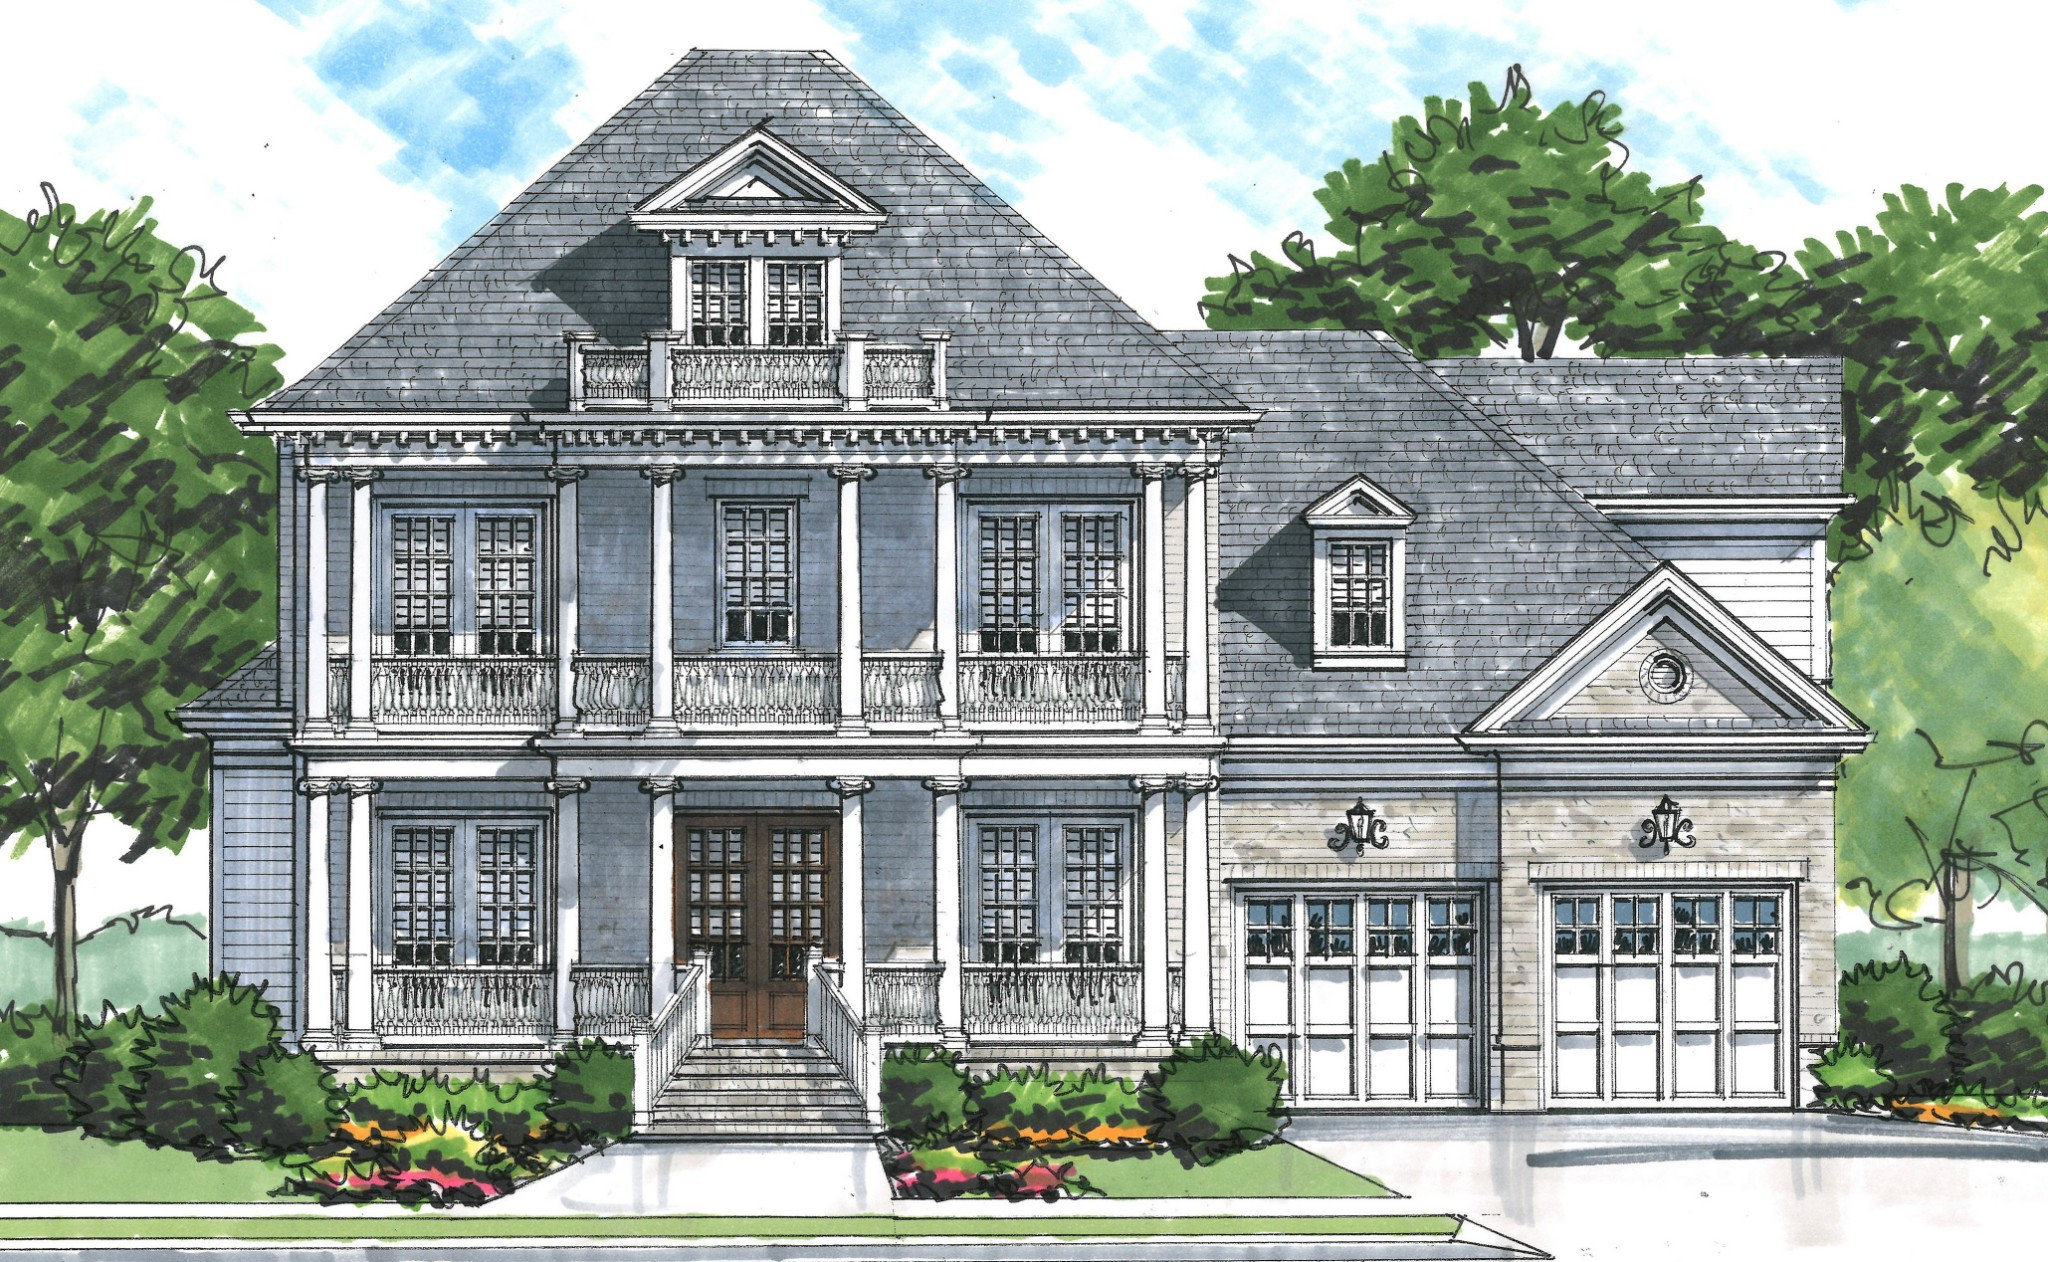 843 Cheltenham Ave, Lot # 2150 Property Photo - Franklin, TN real estate listing